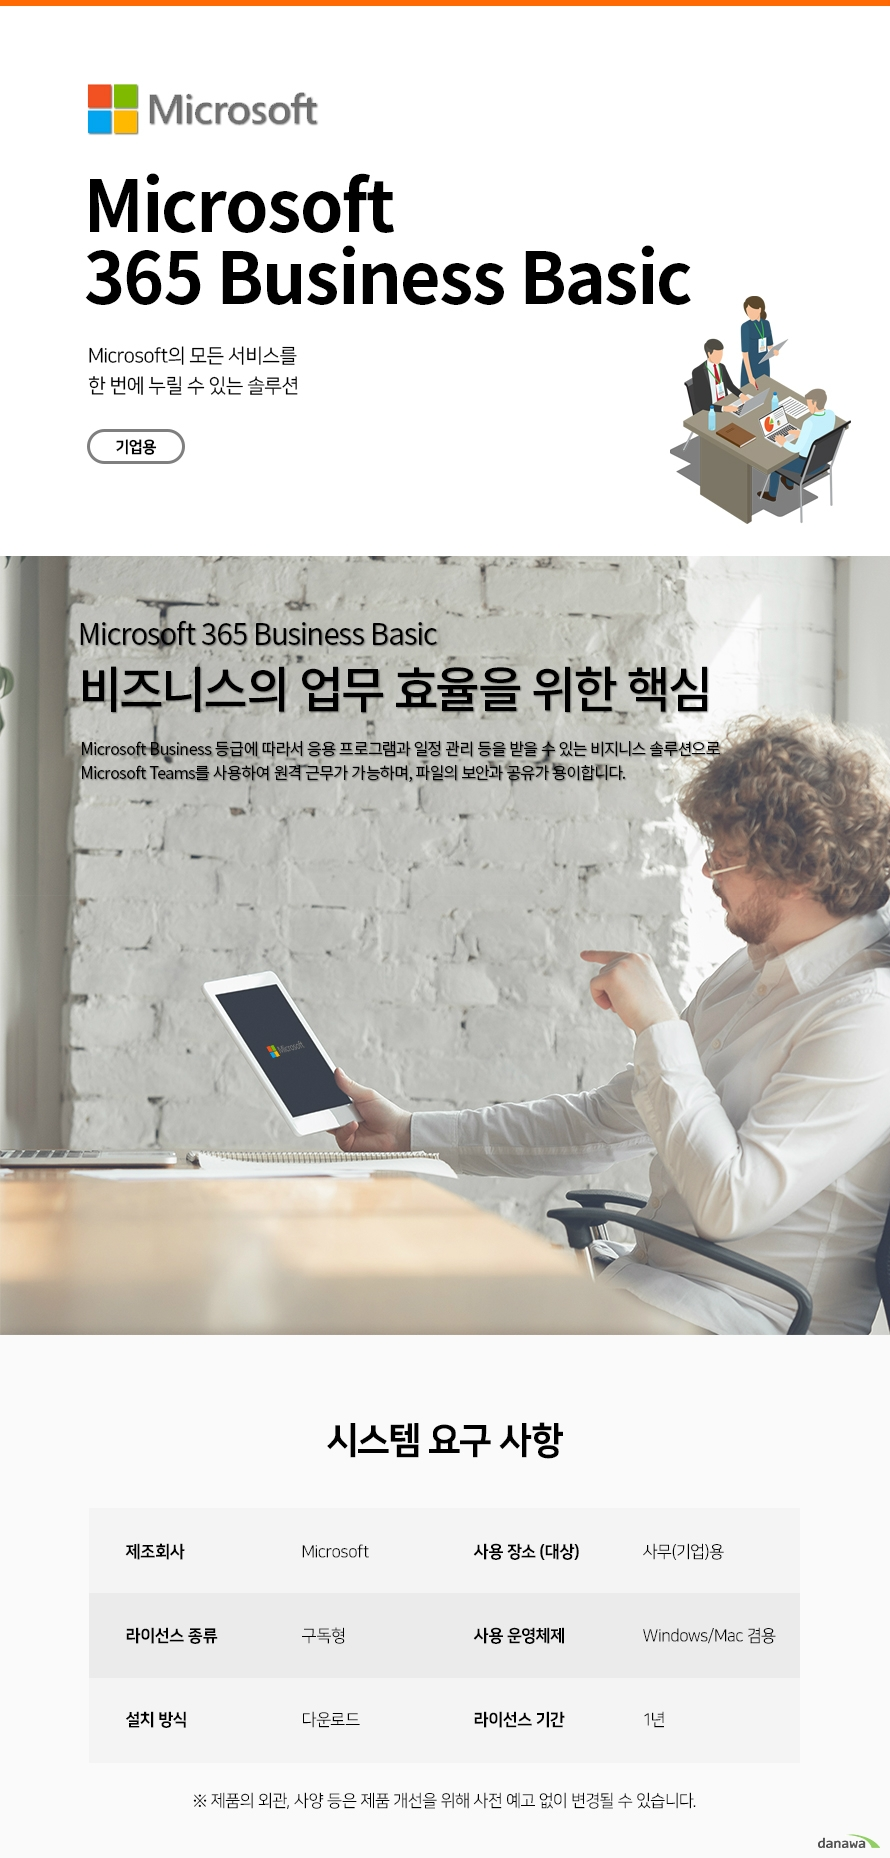 Microsoft 365 Business Basic (1년 라이선스)